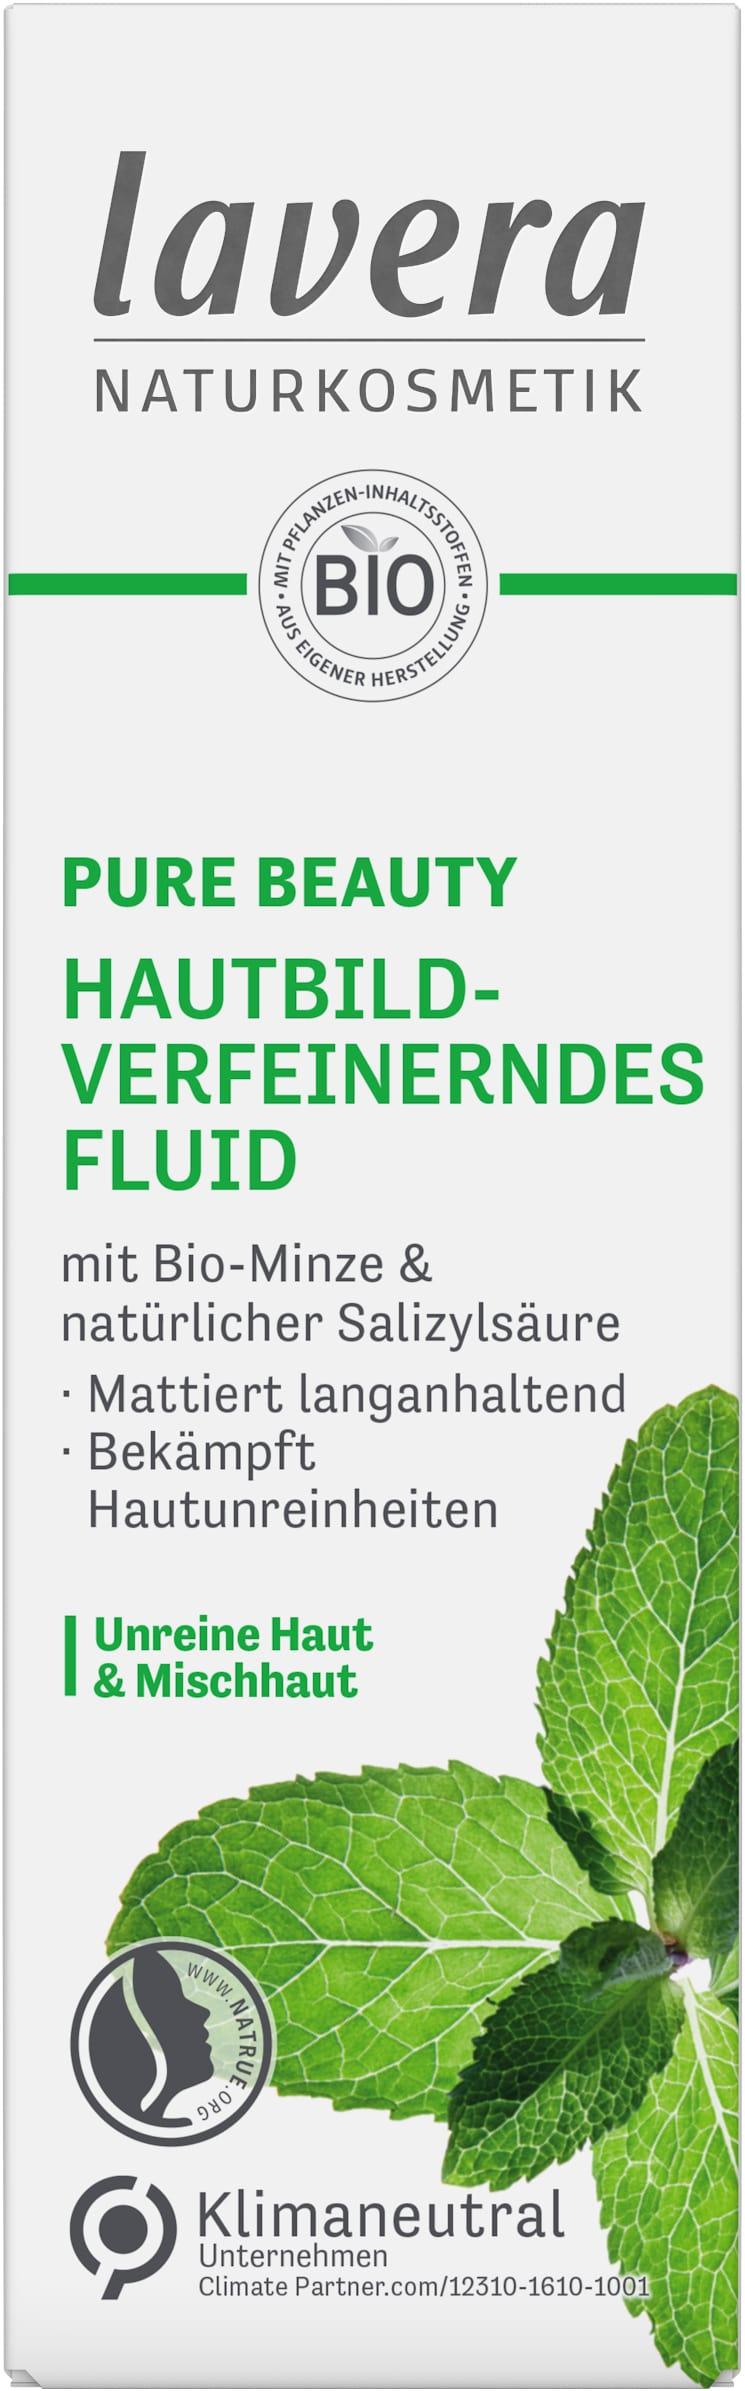 PURE BEAUTY Hautbildverfeinerndes Fluid